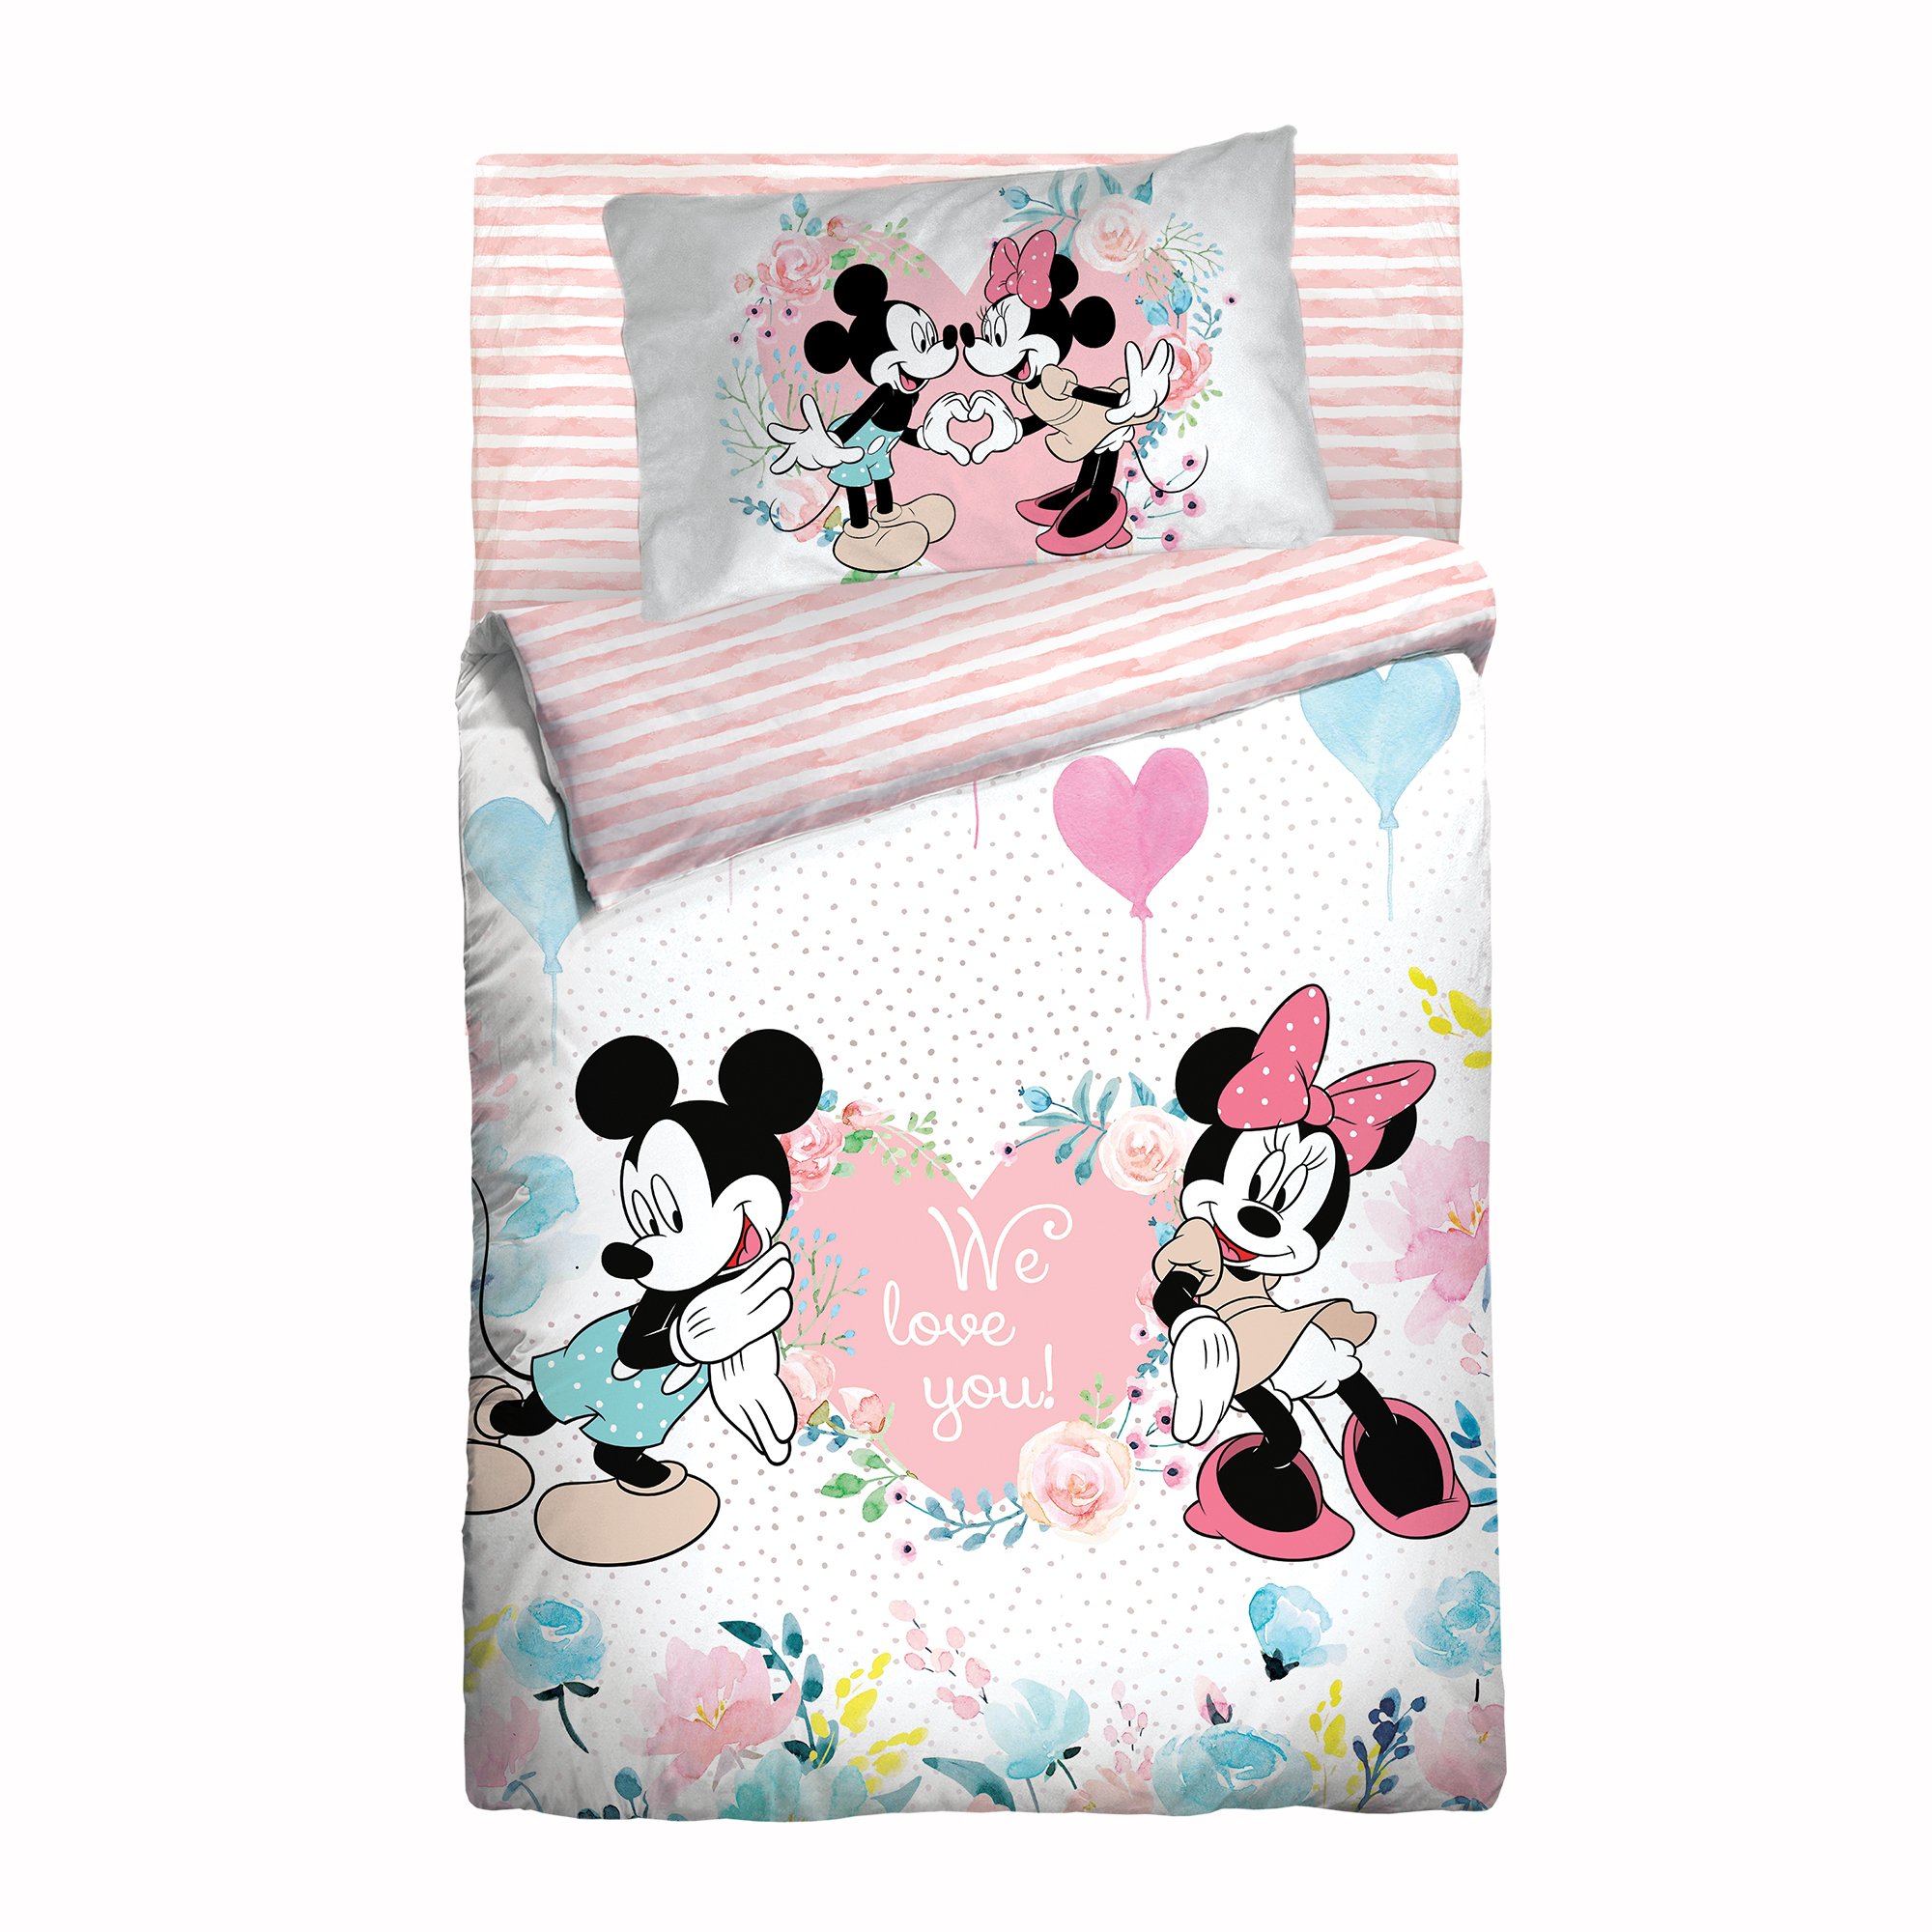 Белье в кроватку из бязи с простыней на резинке Облачко Mickey and Minnie Нордтекс